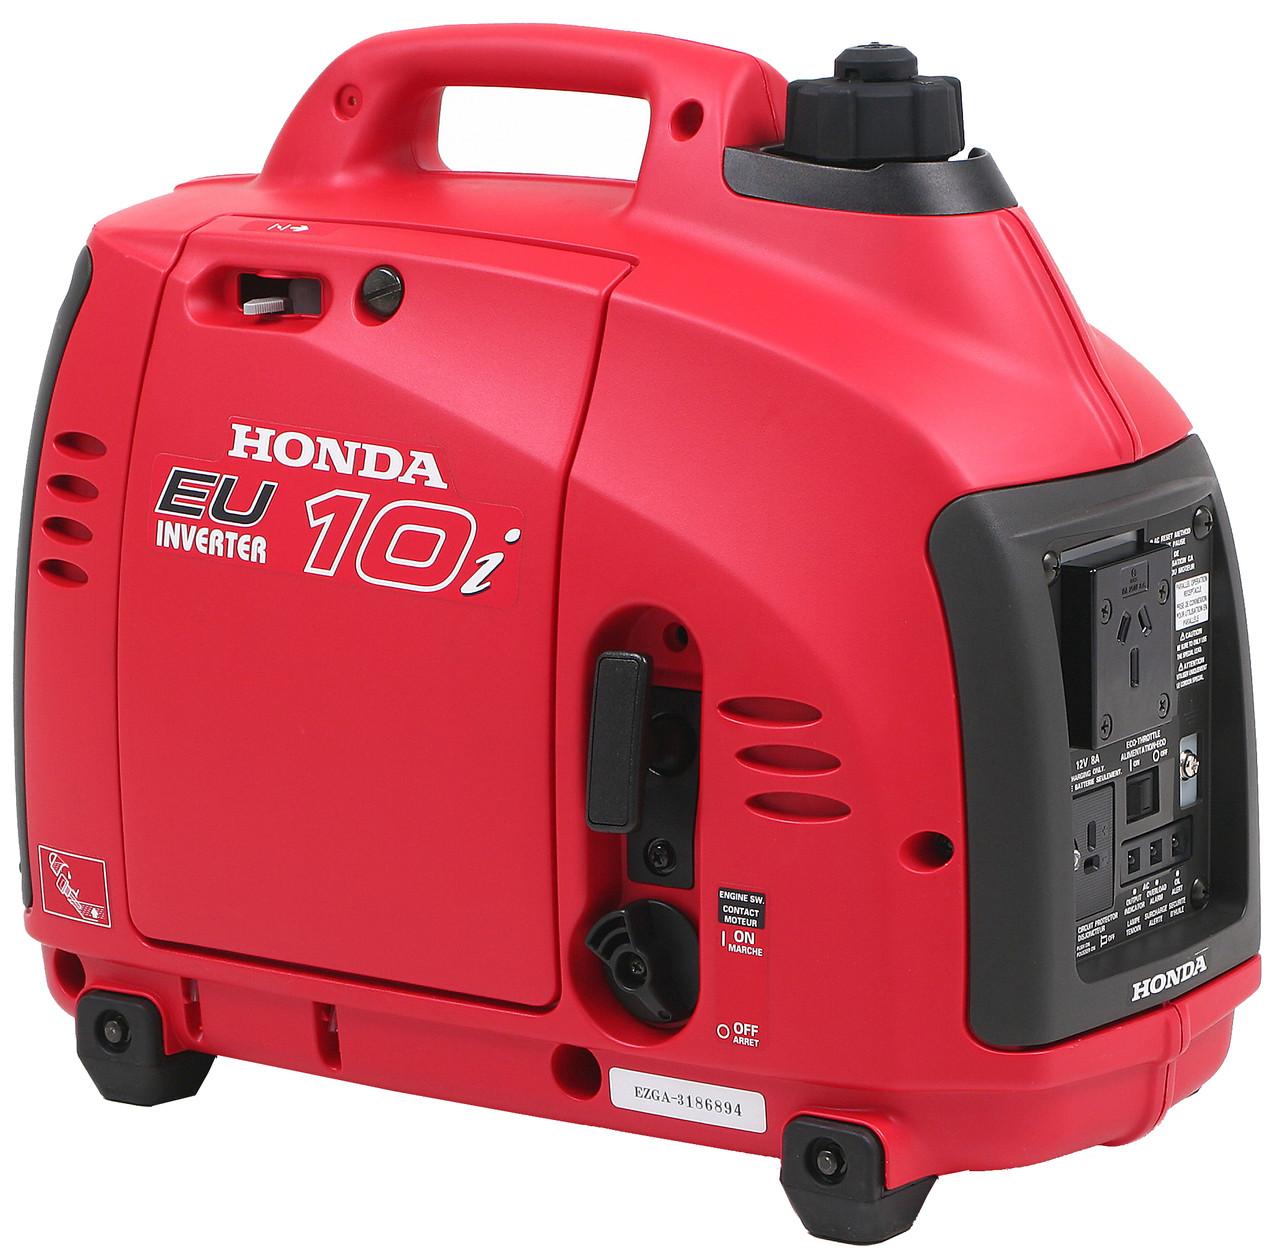 Honda Eu10i 1000w 1kva Inverter Generator Haughton Honda